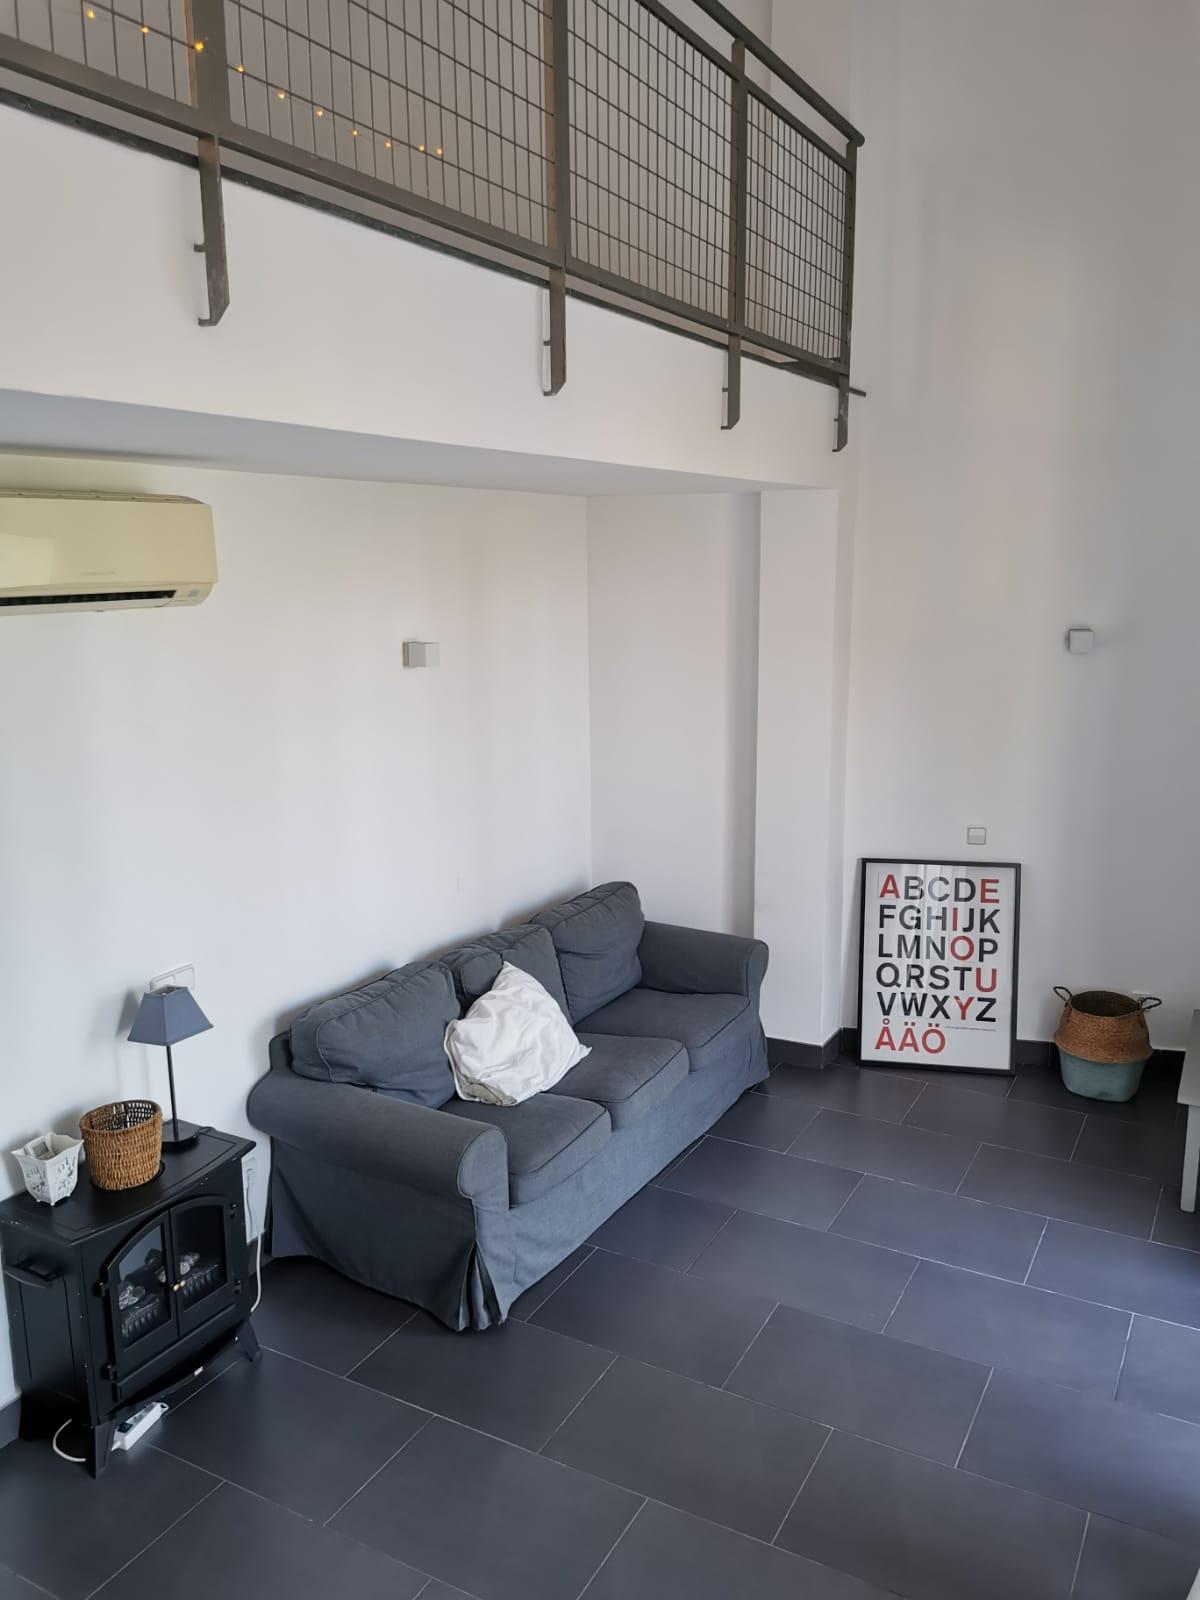 Duplex apartmente for rent in Mahón